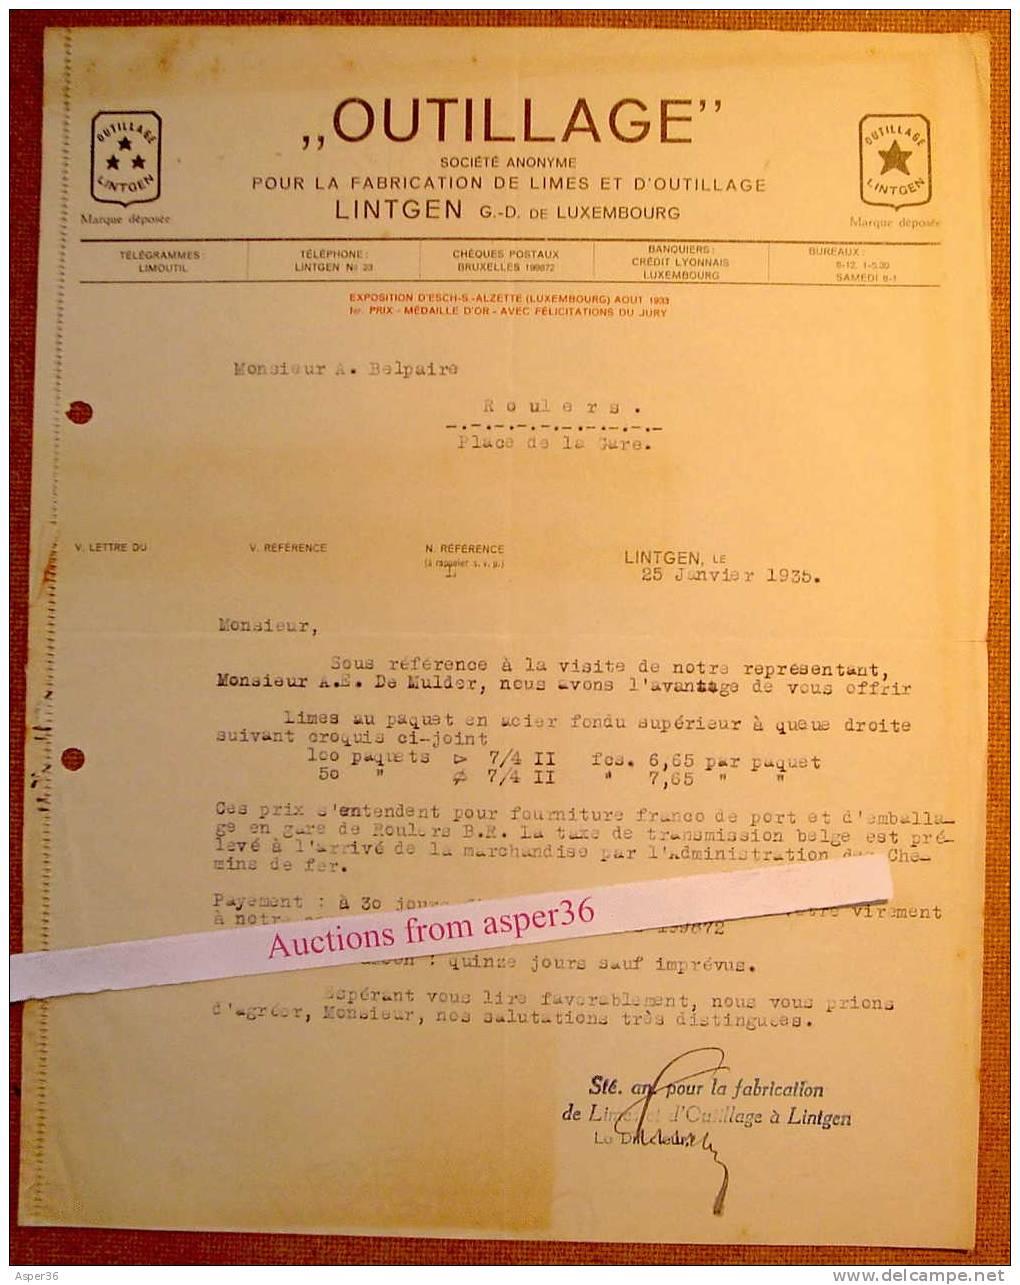 Outillage, Lintgen 1935 - Luxemburgo